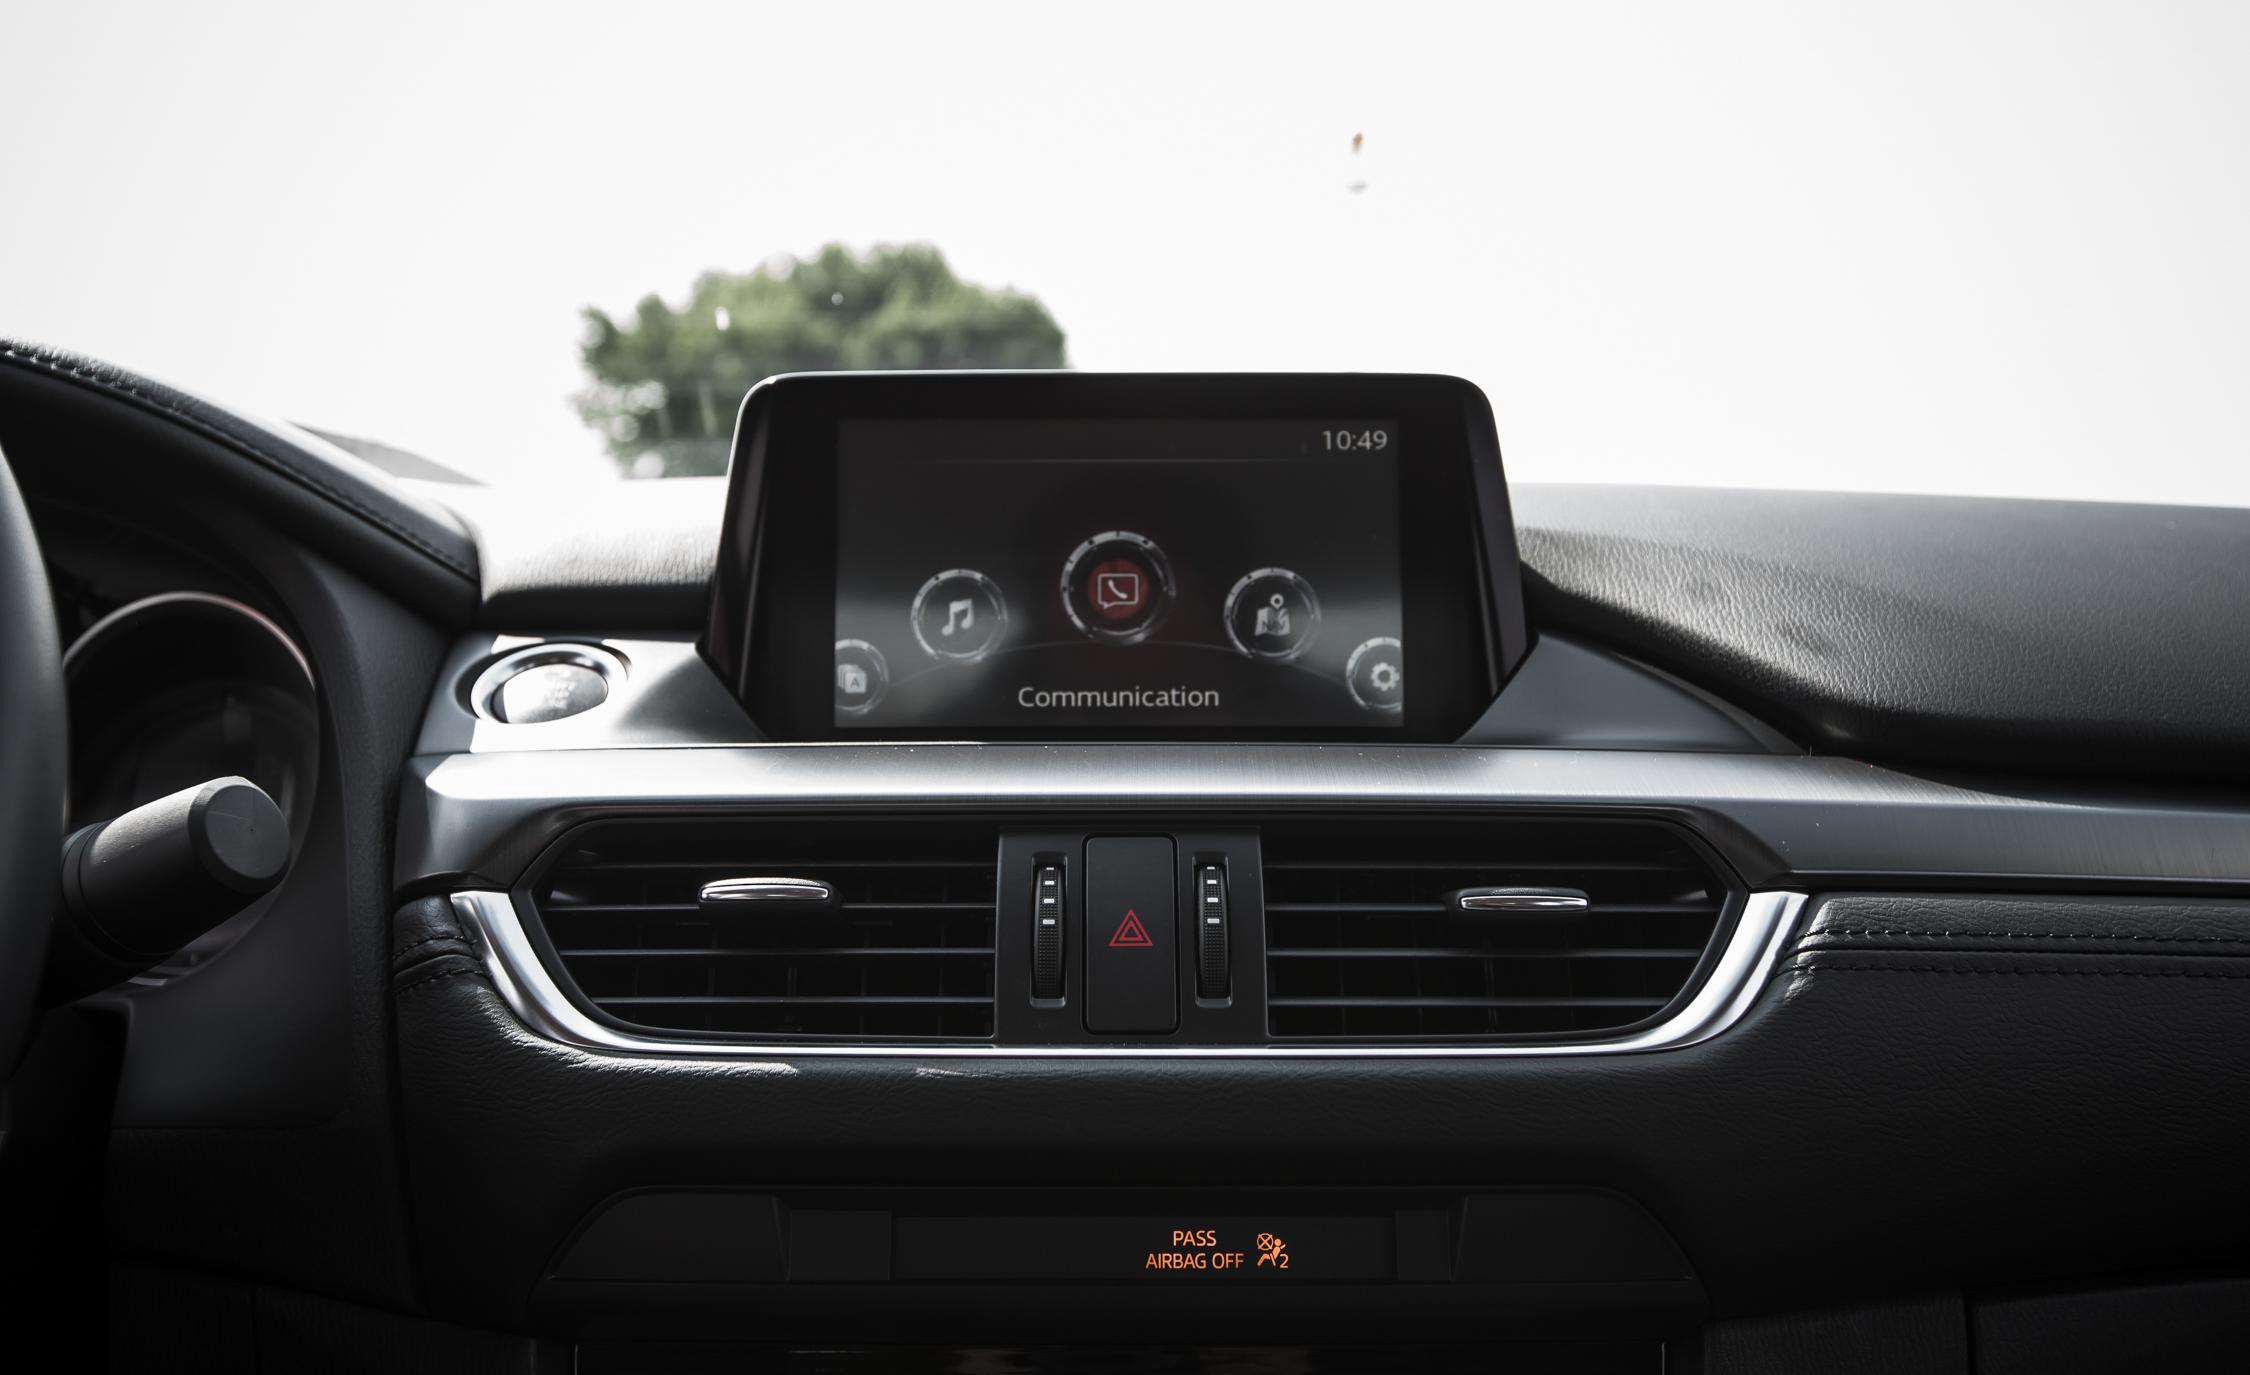 2016 Mazda 6 Touring Interior Center Head Unit